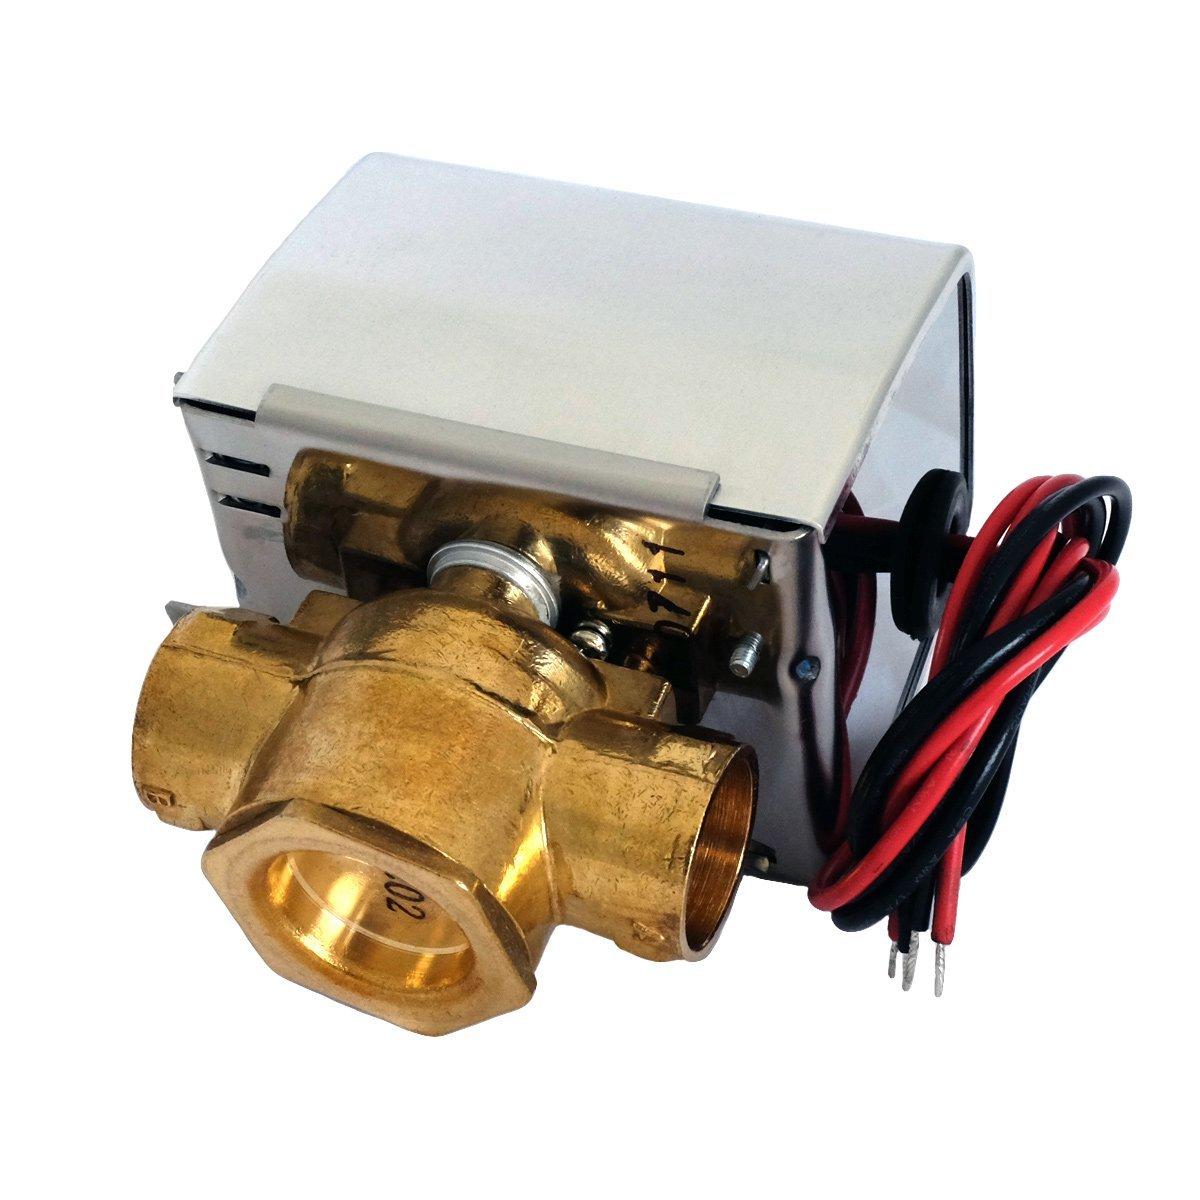 Valemo V2313-A1S Motorized Zone Valve, 2-way 3/4'', Sweat, 24 VAC with End Switch by Valemo Controls (Image #3)